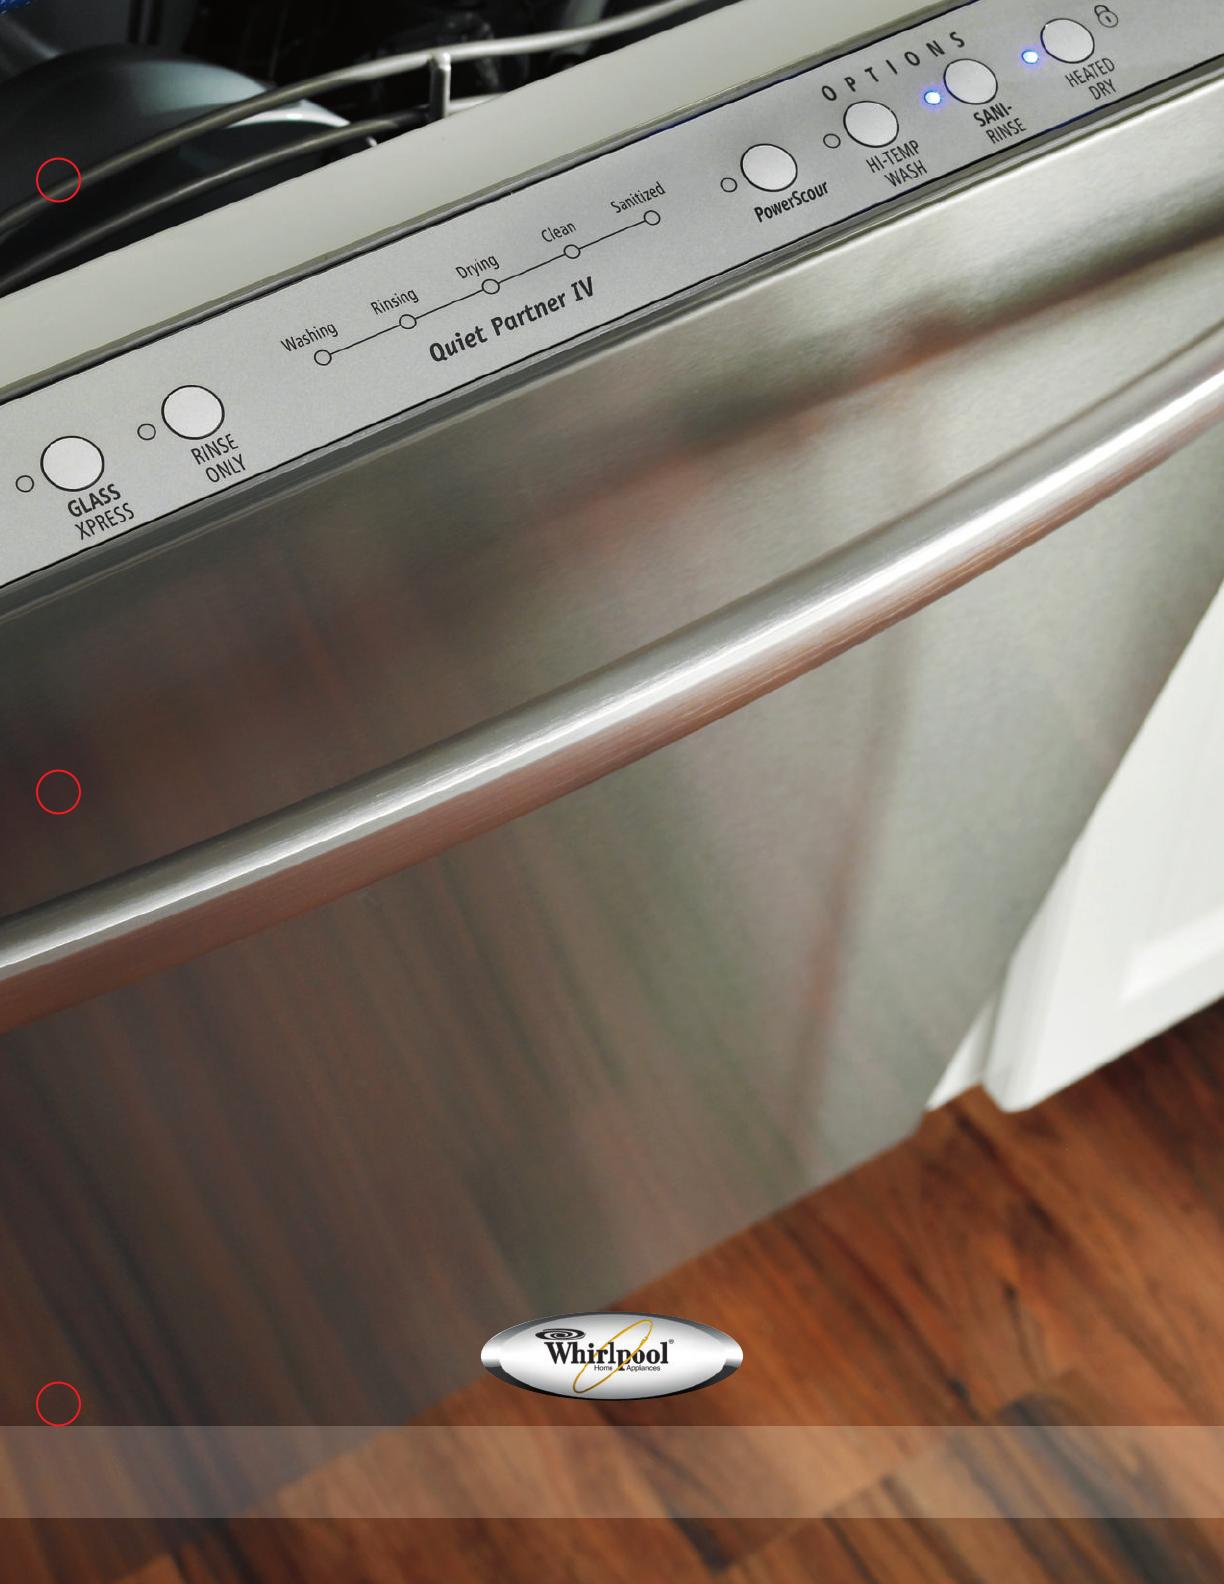 Whirlpool Dishwasher Gu2475Xtvy Users Manual WD090295 whirlpool dishwasher models UserManual.wiki